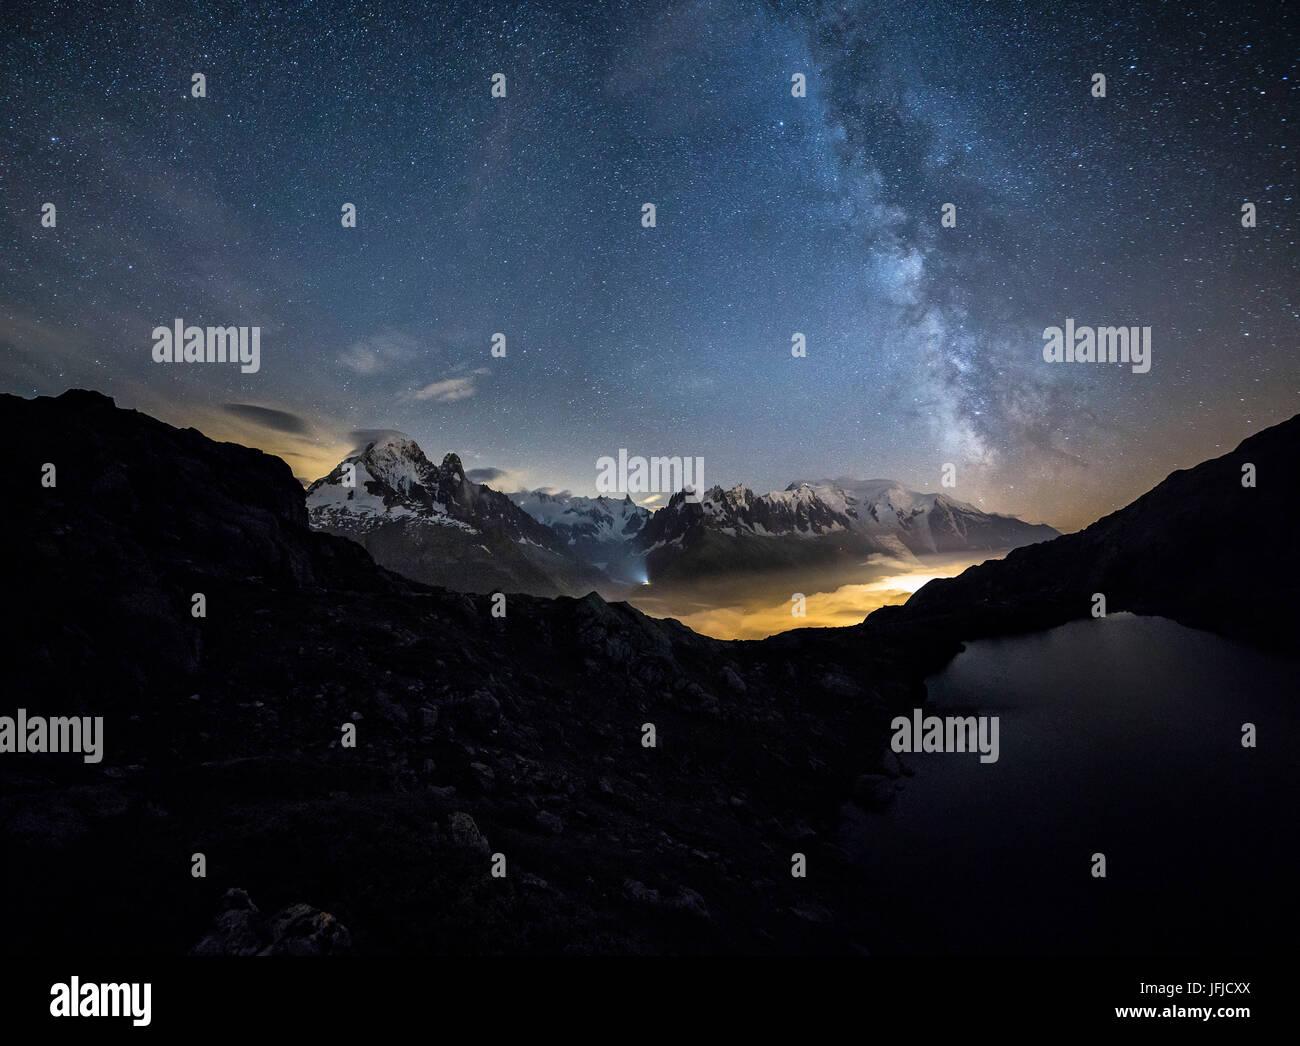 Stars and Milky Way illuminate the snowy peaks around Lac de Cheserys Chamonix Haute Savoie France Europe - Stock Image